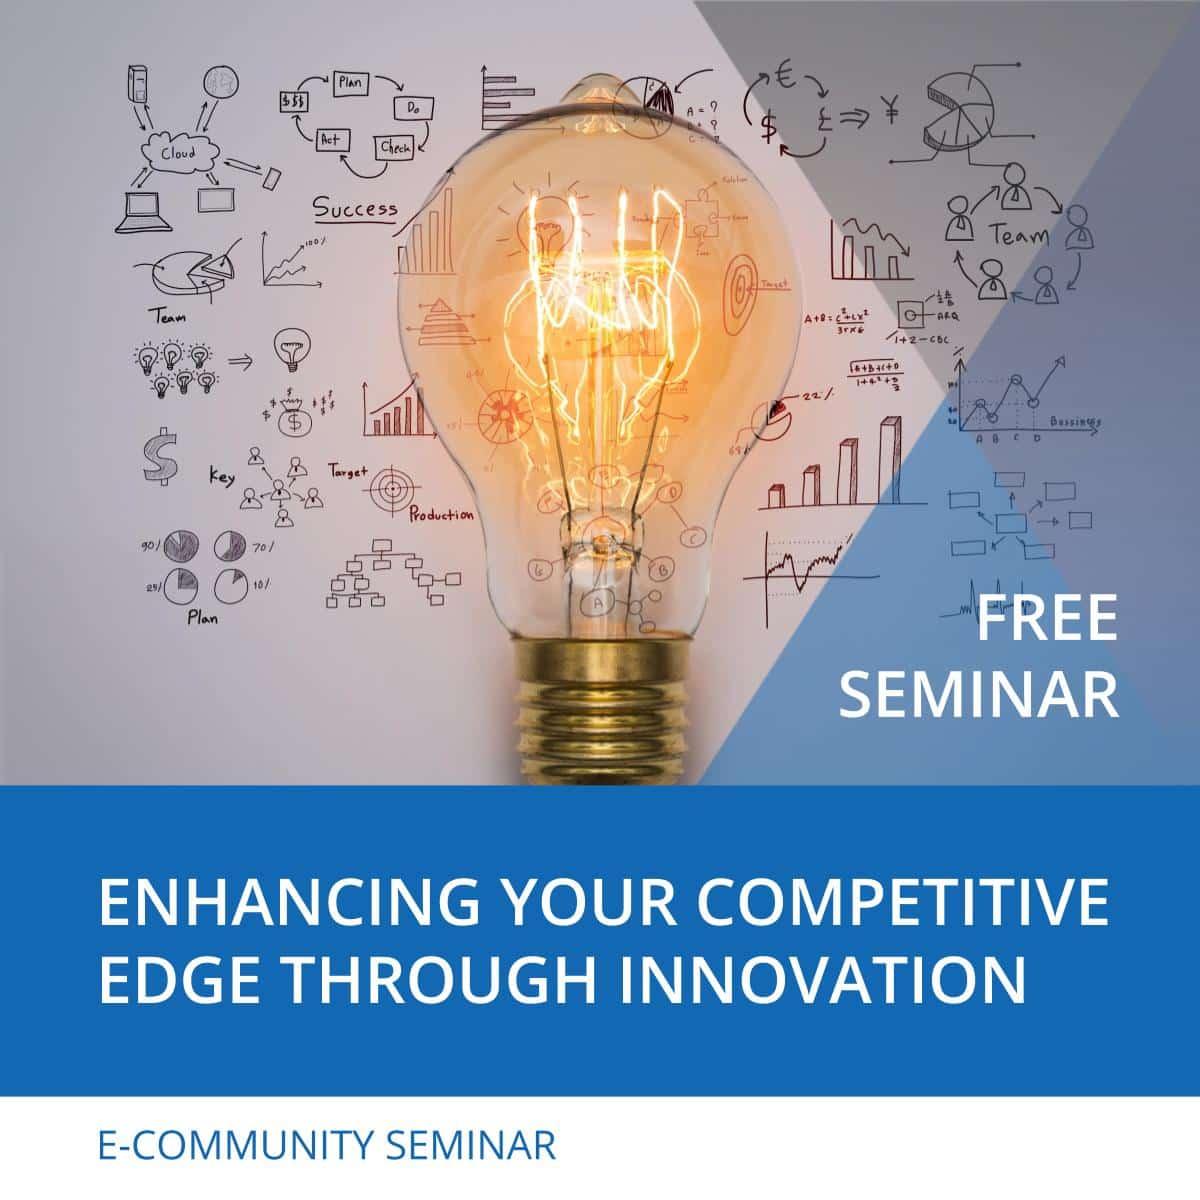 Enhancing Your Competitive Edge through Innovation - Nehemiah E-Community